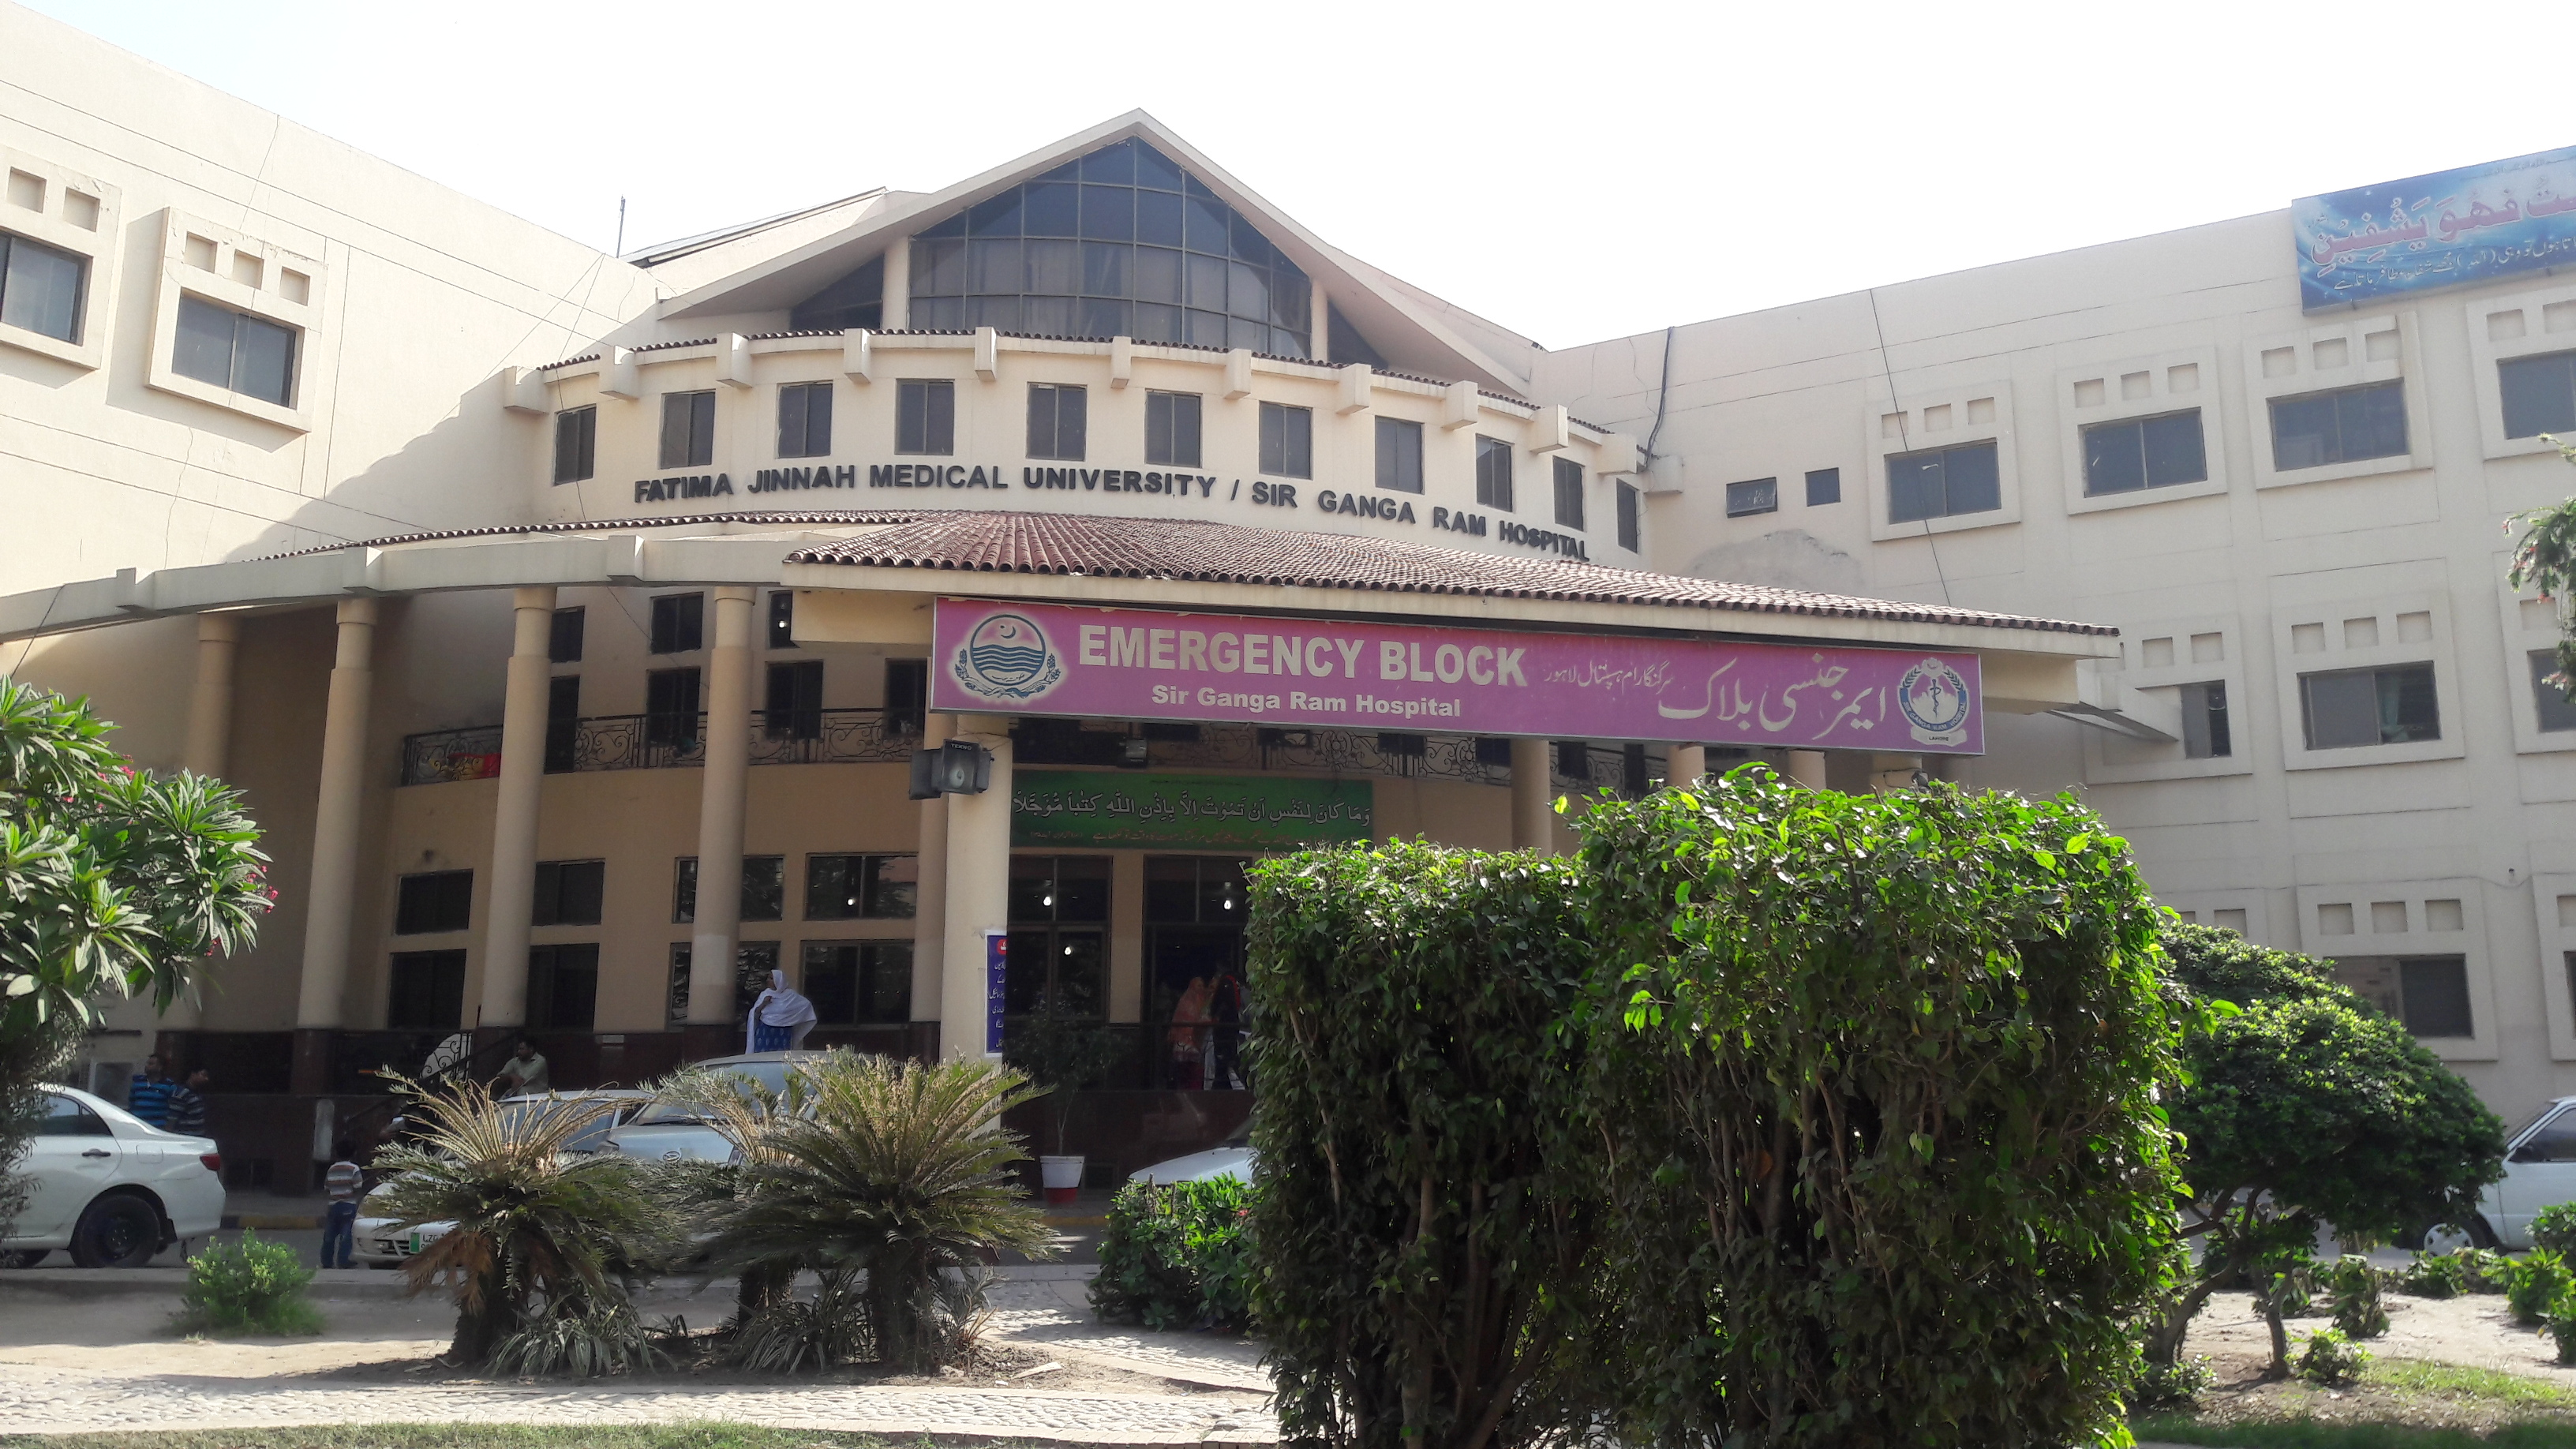 Sir Ganga Ram Hospital (Pakistan) - Wikipedia